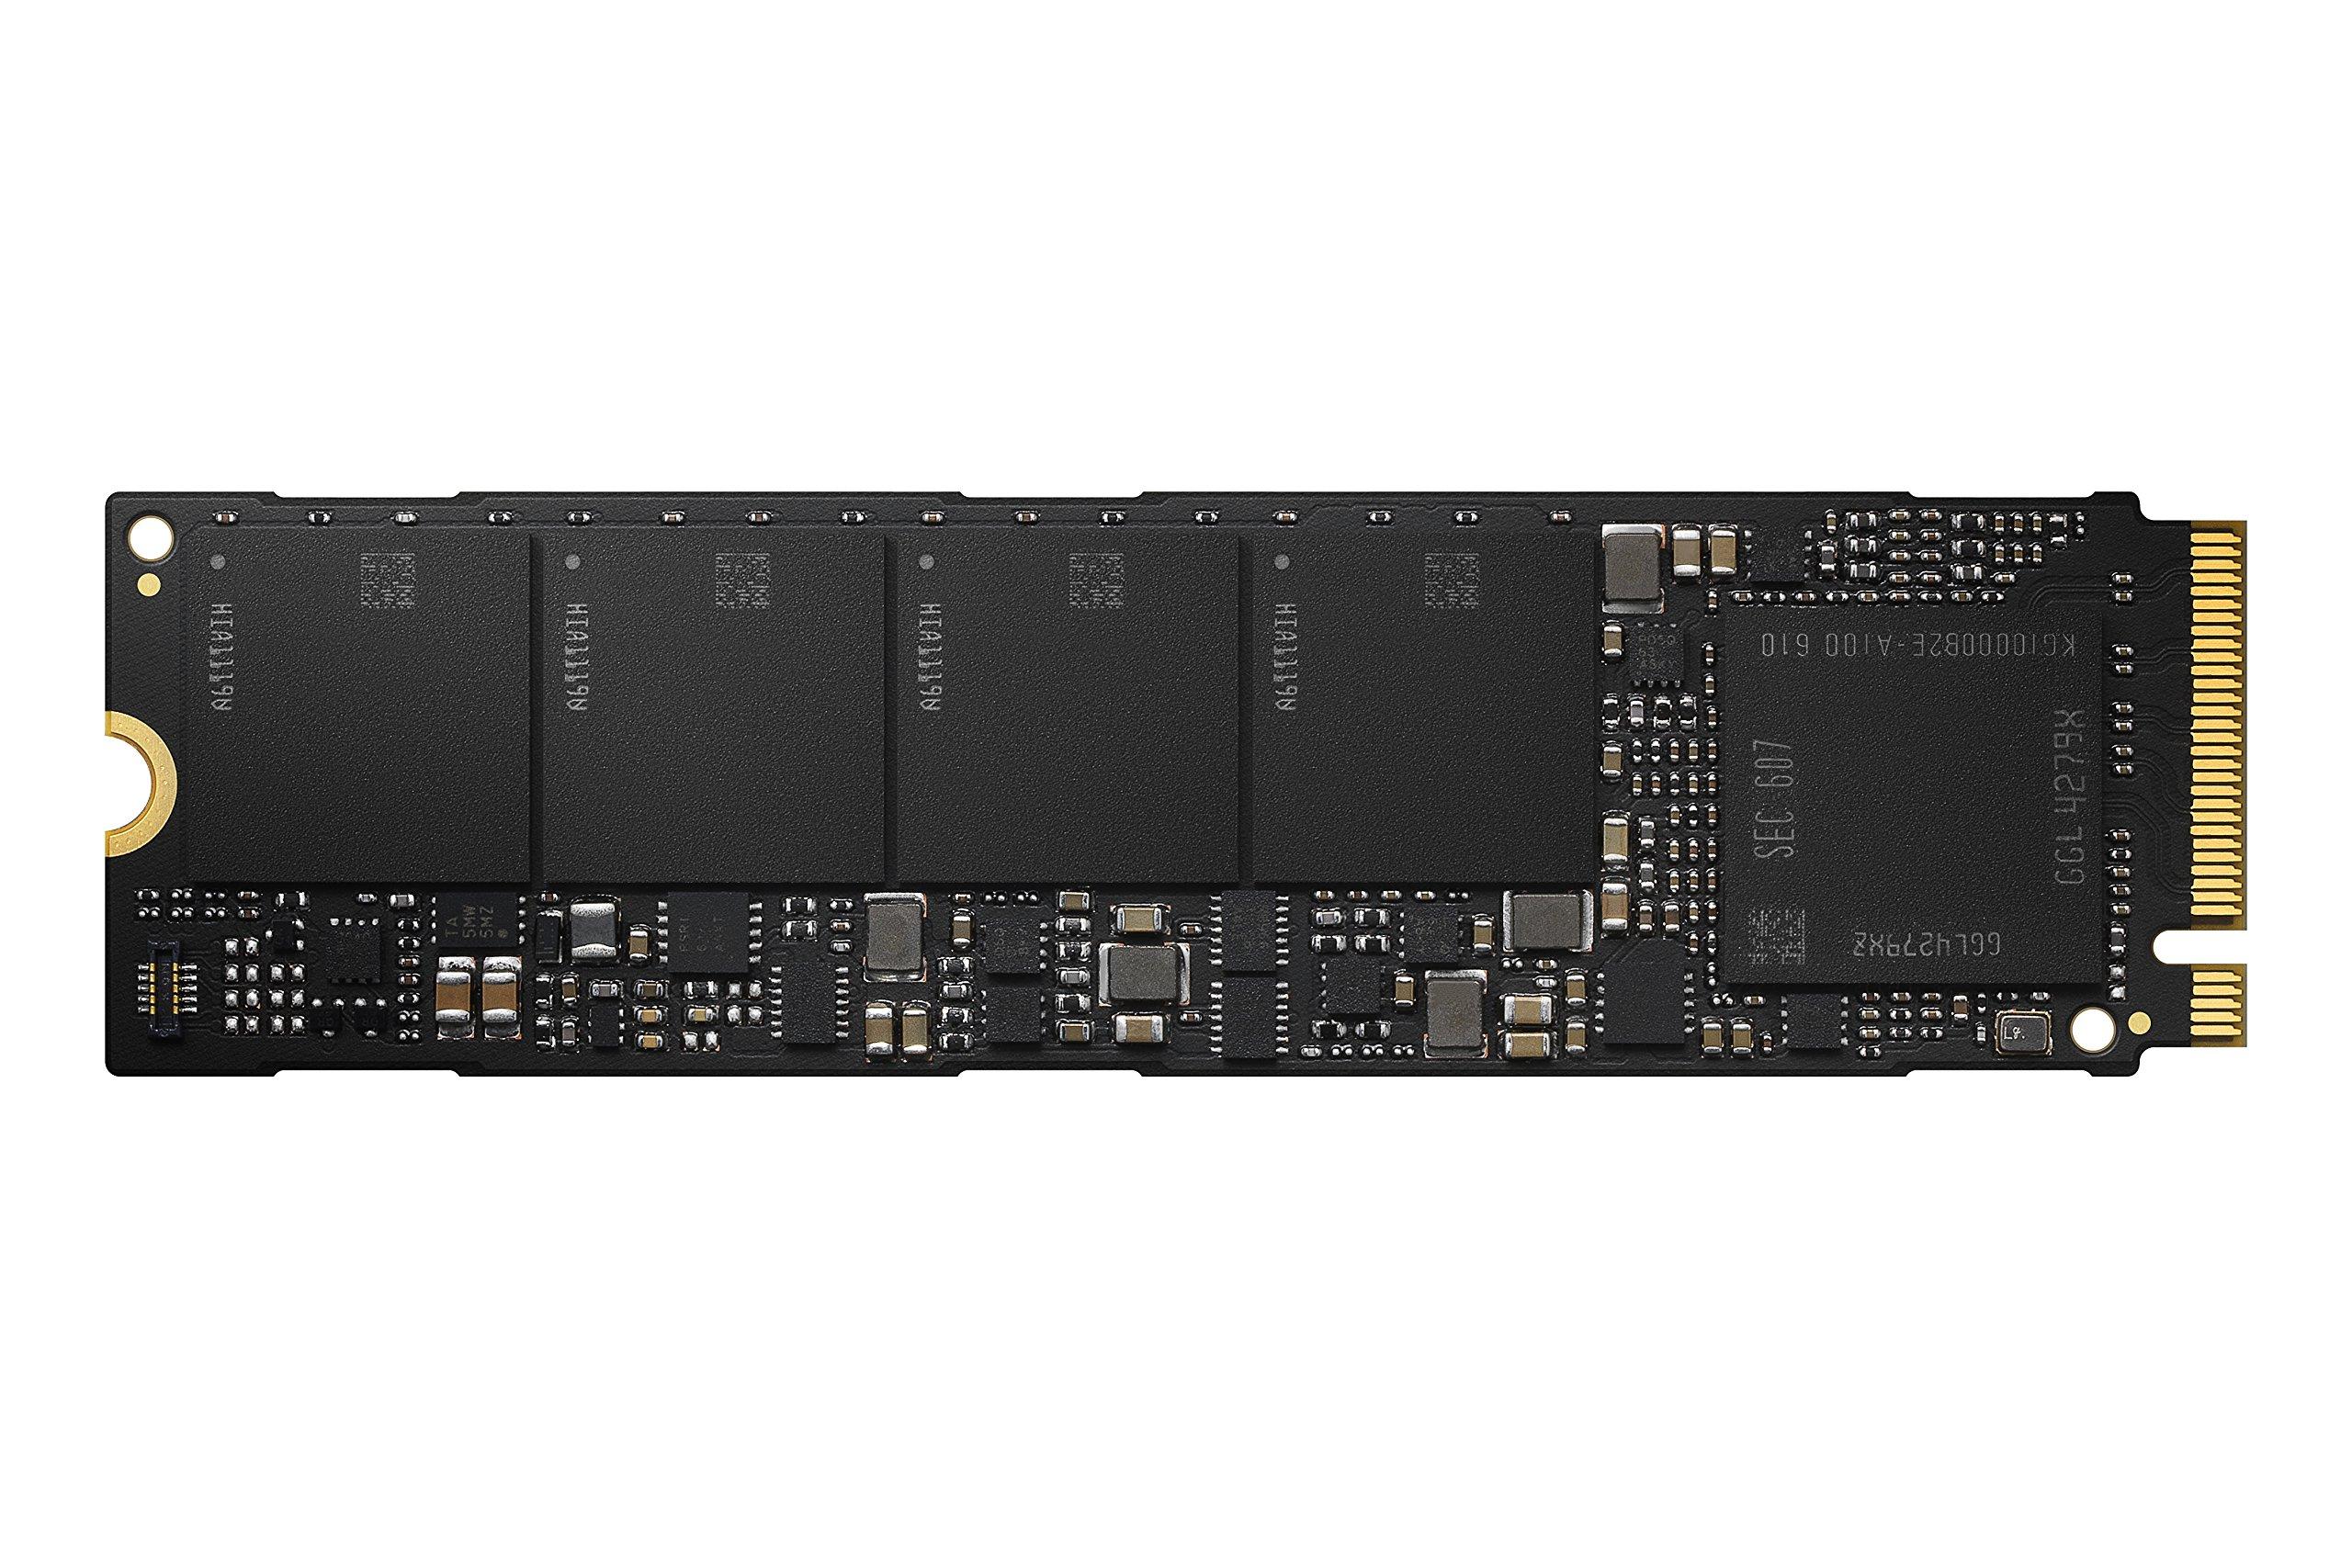 Samsung 960 PRO Series - 512GB PCIe NVMe - M.2 Internal SSD (MZ-V6P512BW) by Samsung (Image #4)